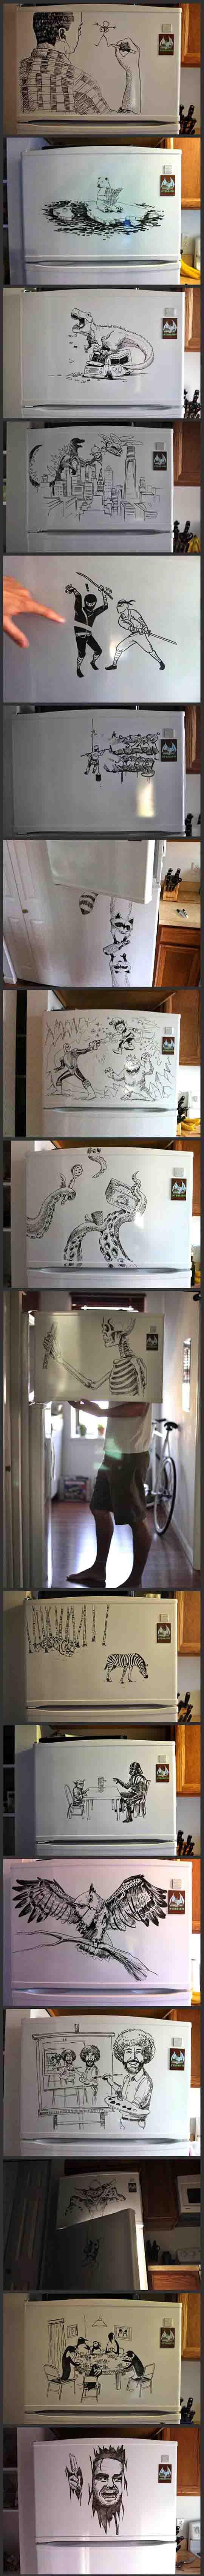 Clever Freezer Art